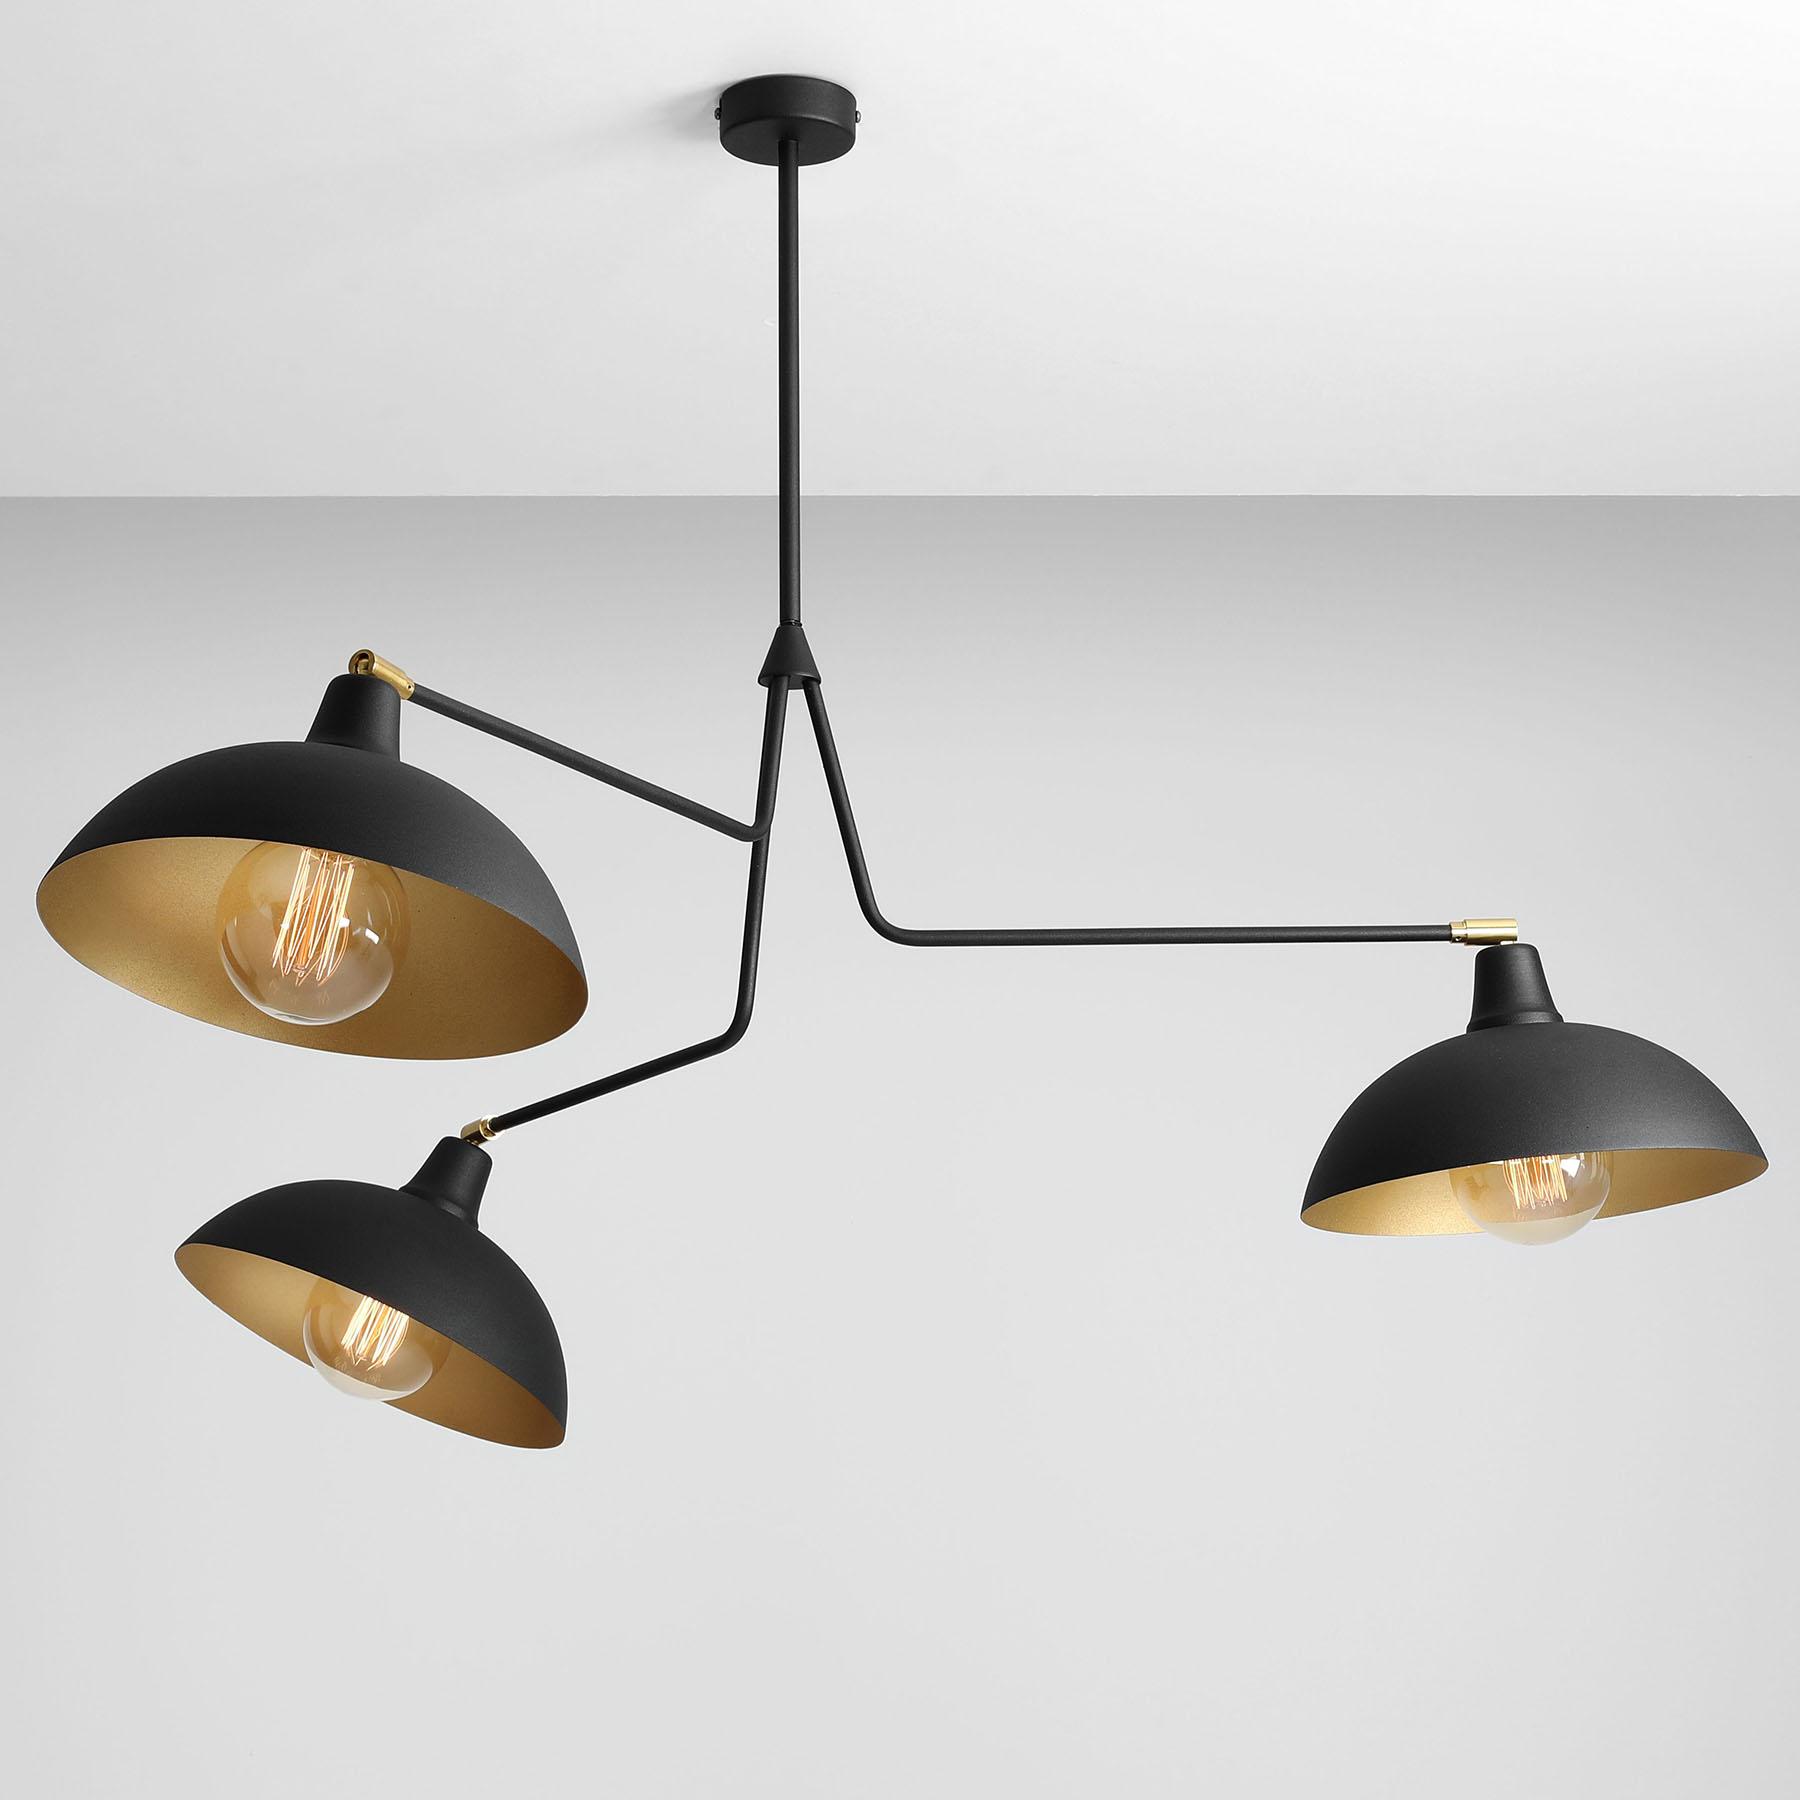 Hanglamp 1036, 3-lamps, zwart-goud